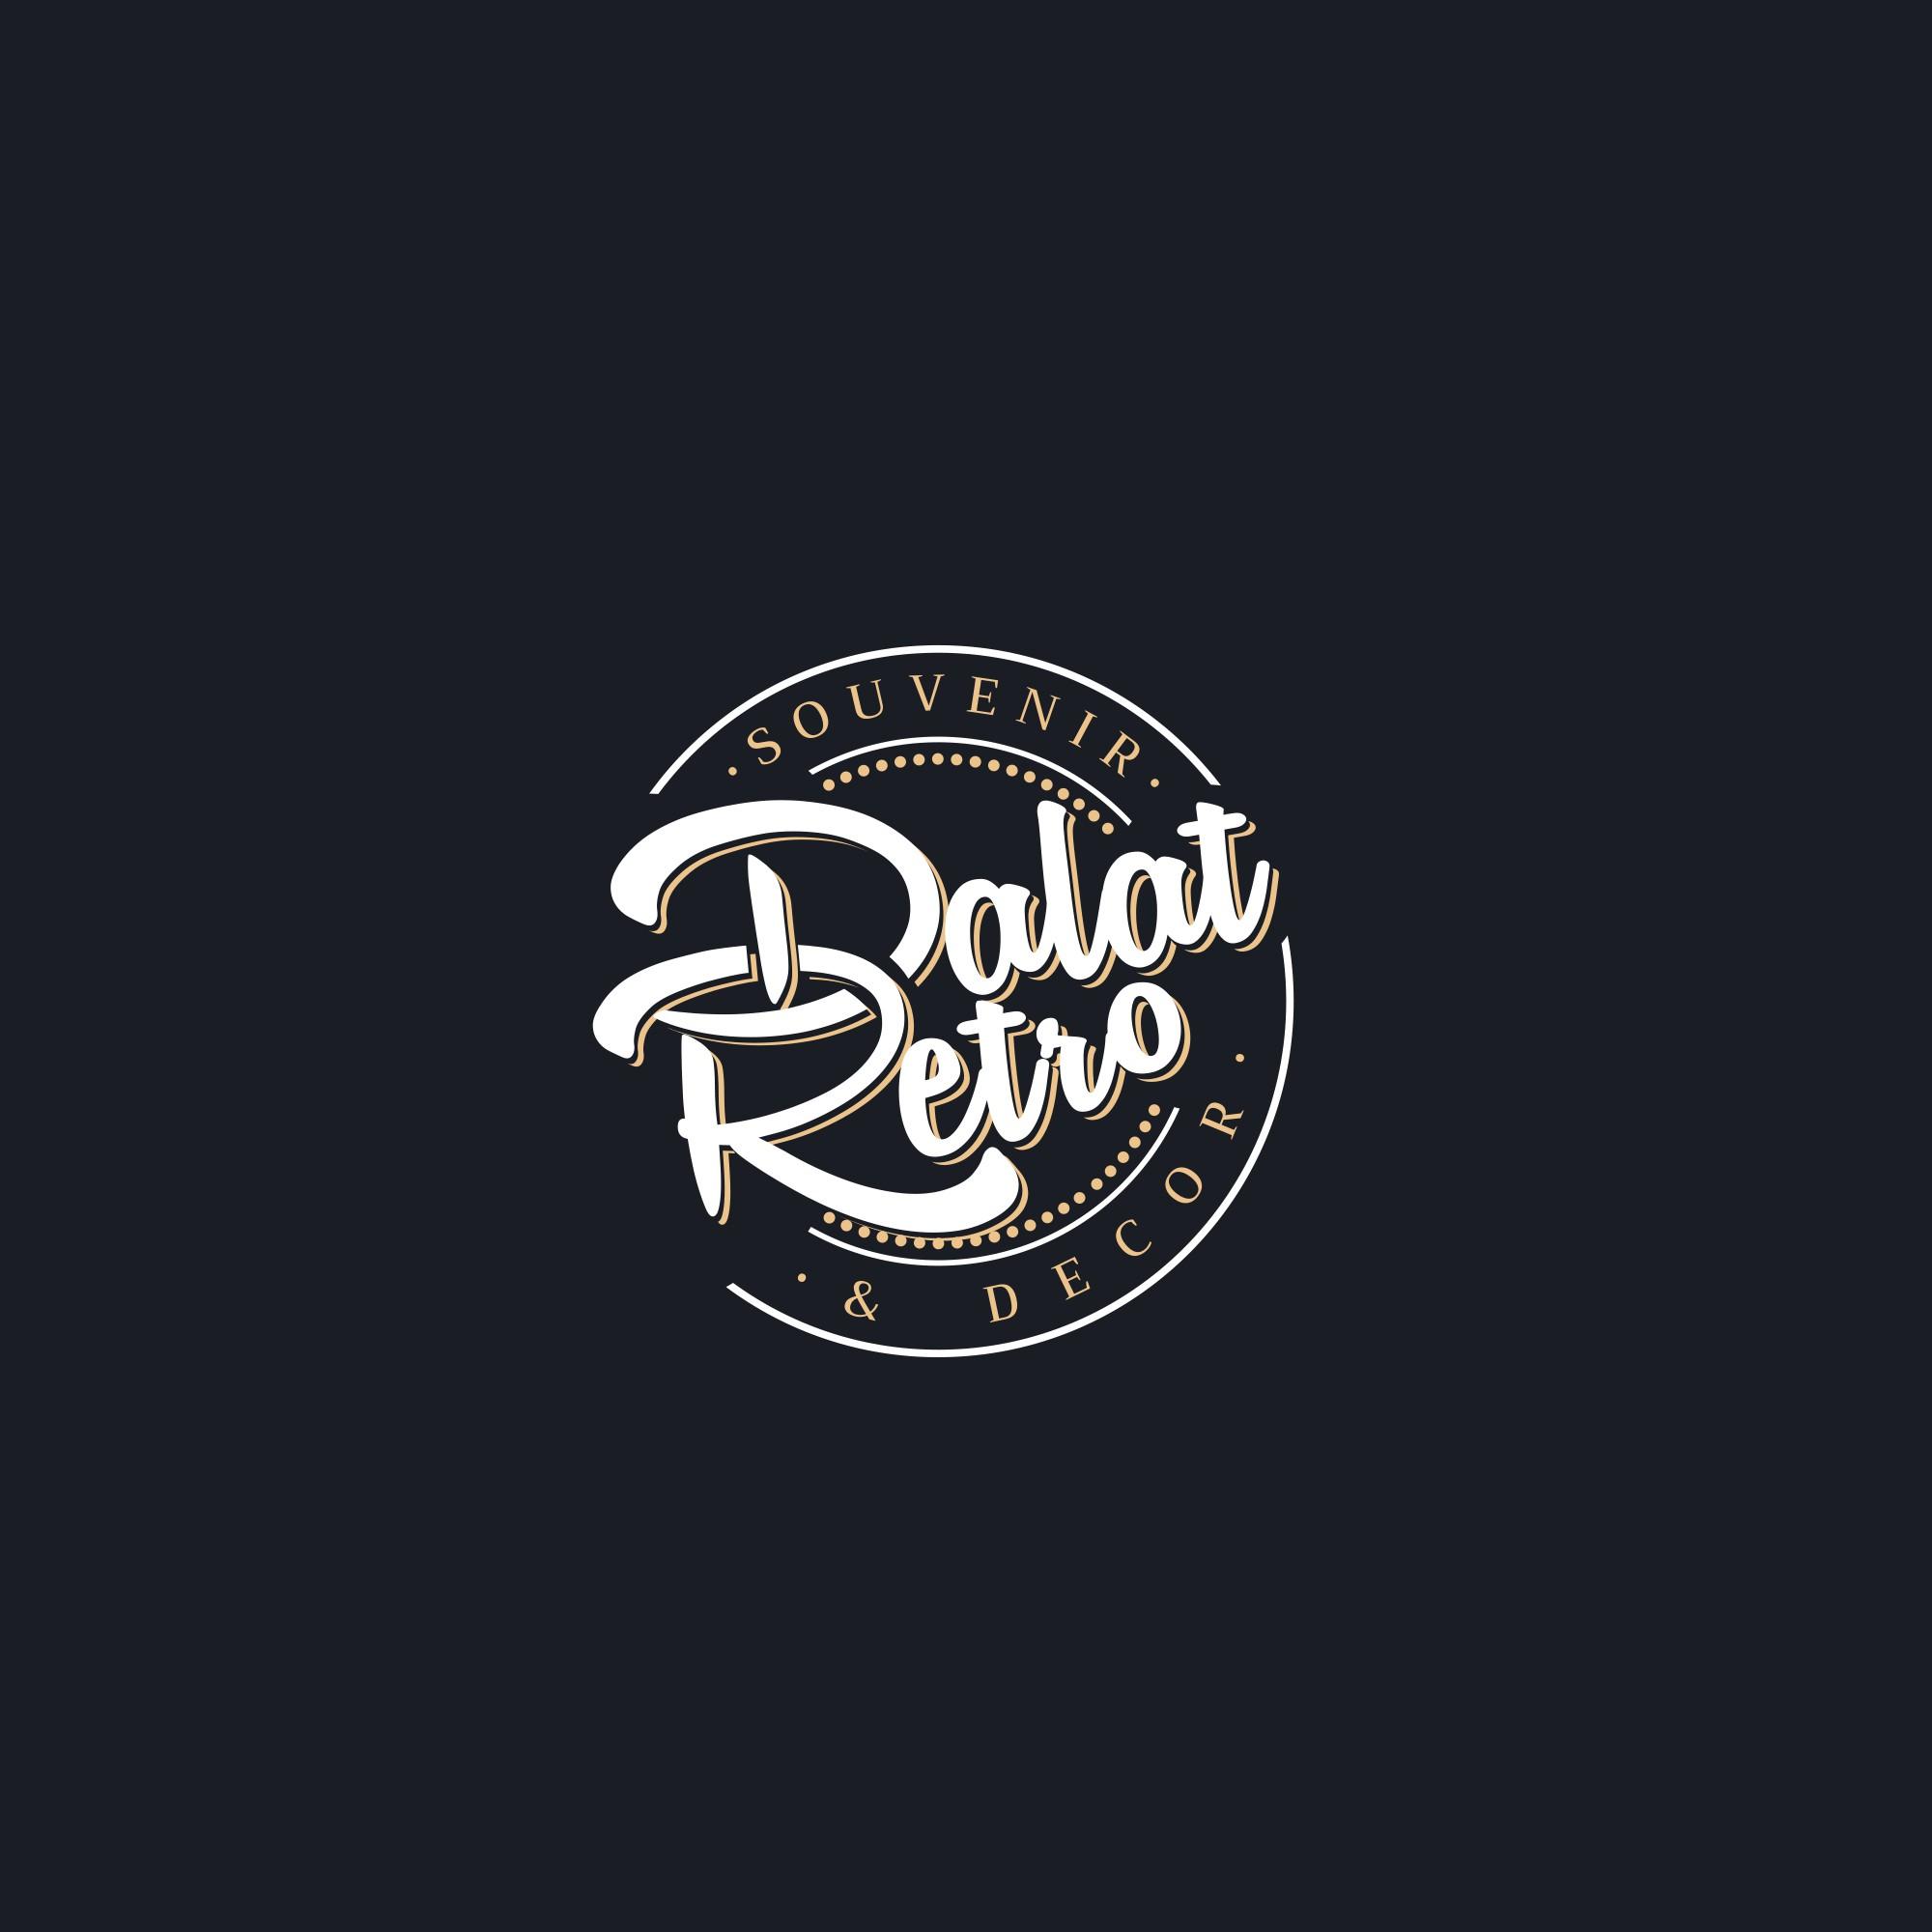 Create a vintage logo for Dalat Retro